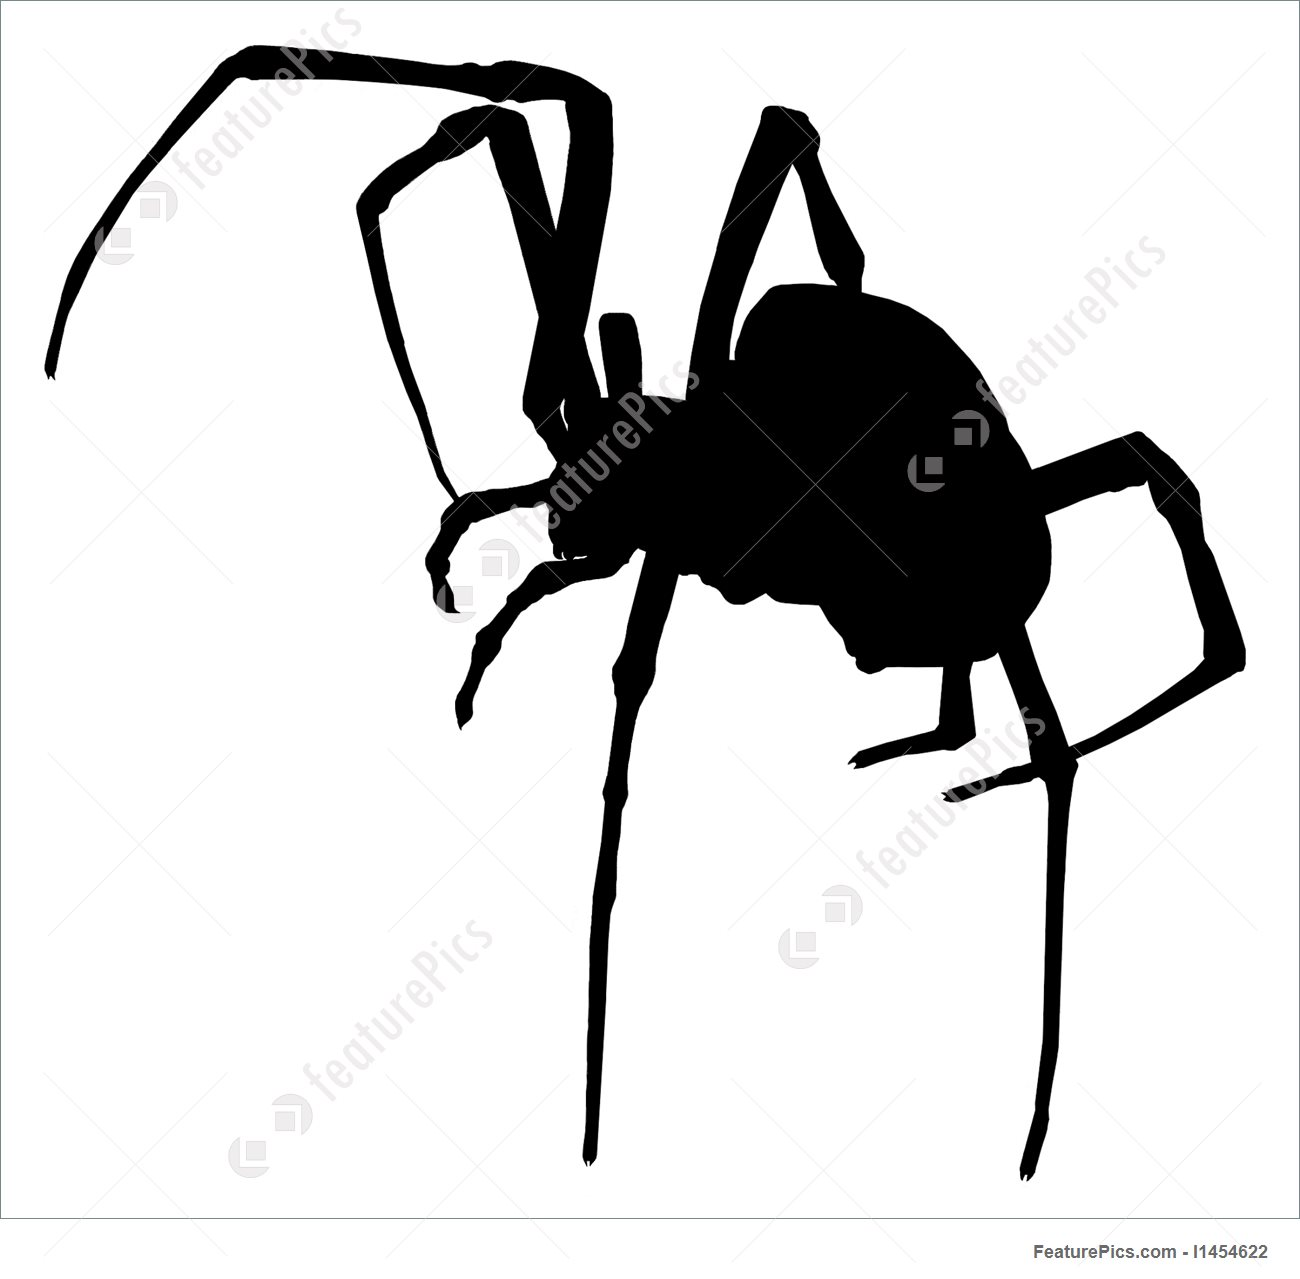 1300x1279 Spooky Halloween Spider Silhouette Illustration